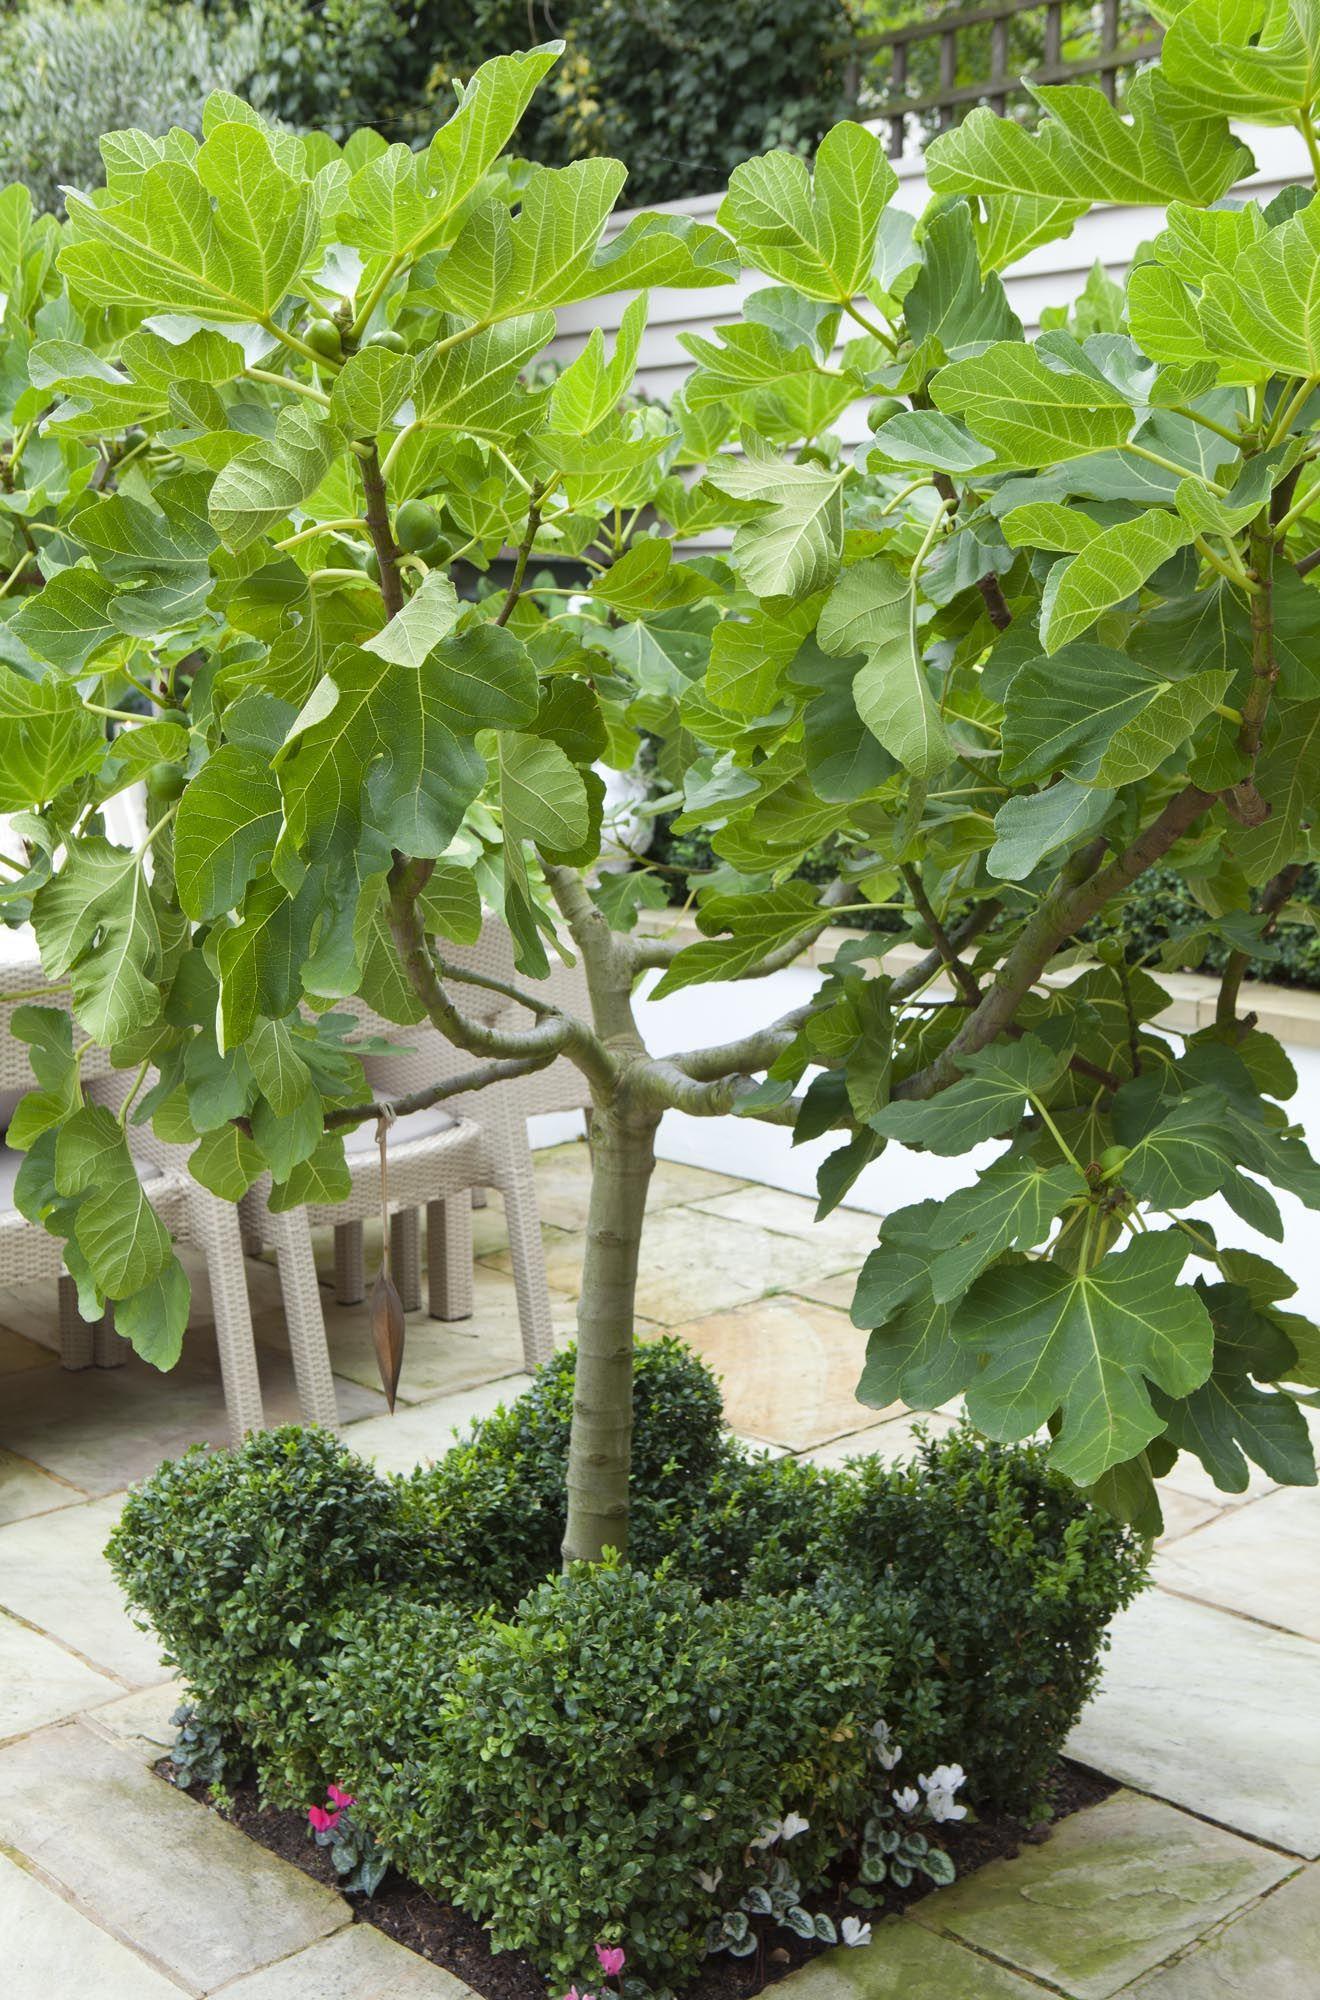 Claire Mee London Garden Designs Garden Trees Garden Shrubs Mediterranean Garden